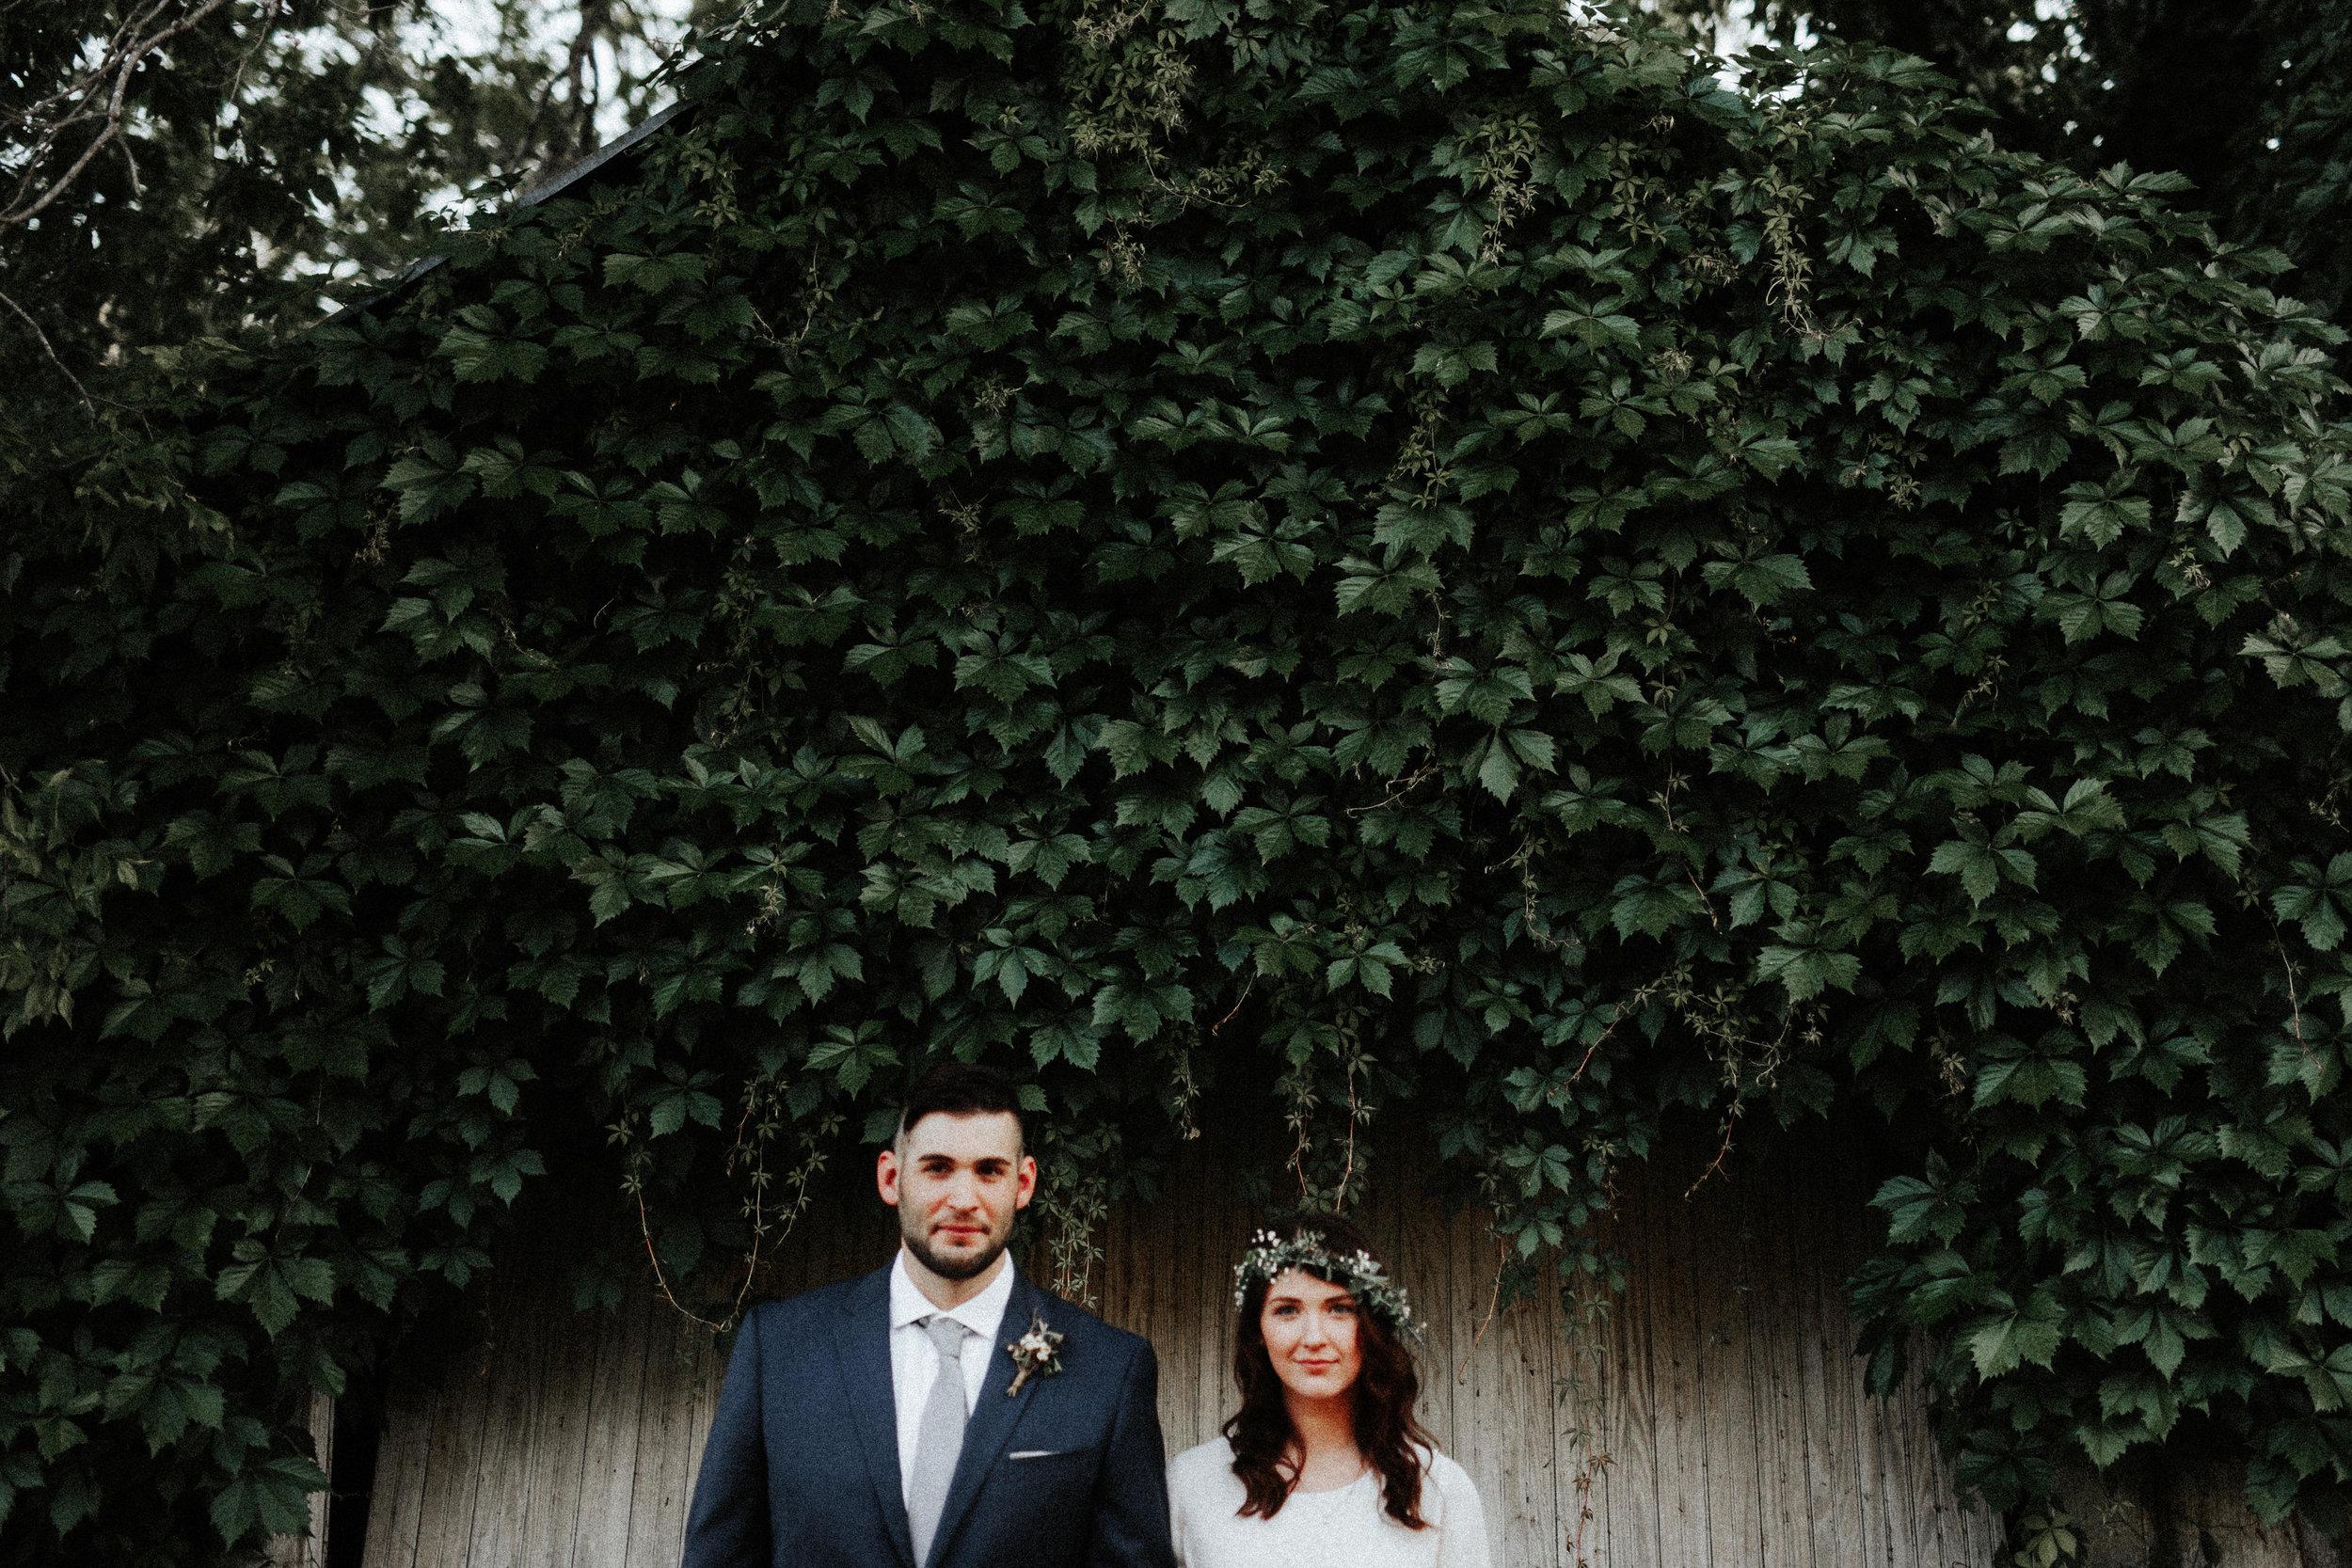 austin-wedding-photographer-41.jpg